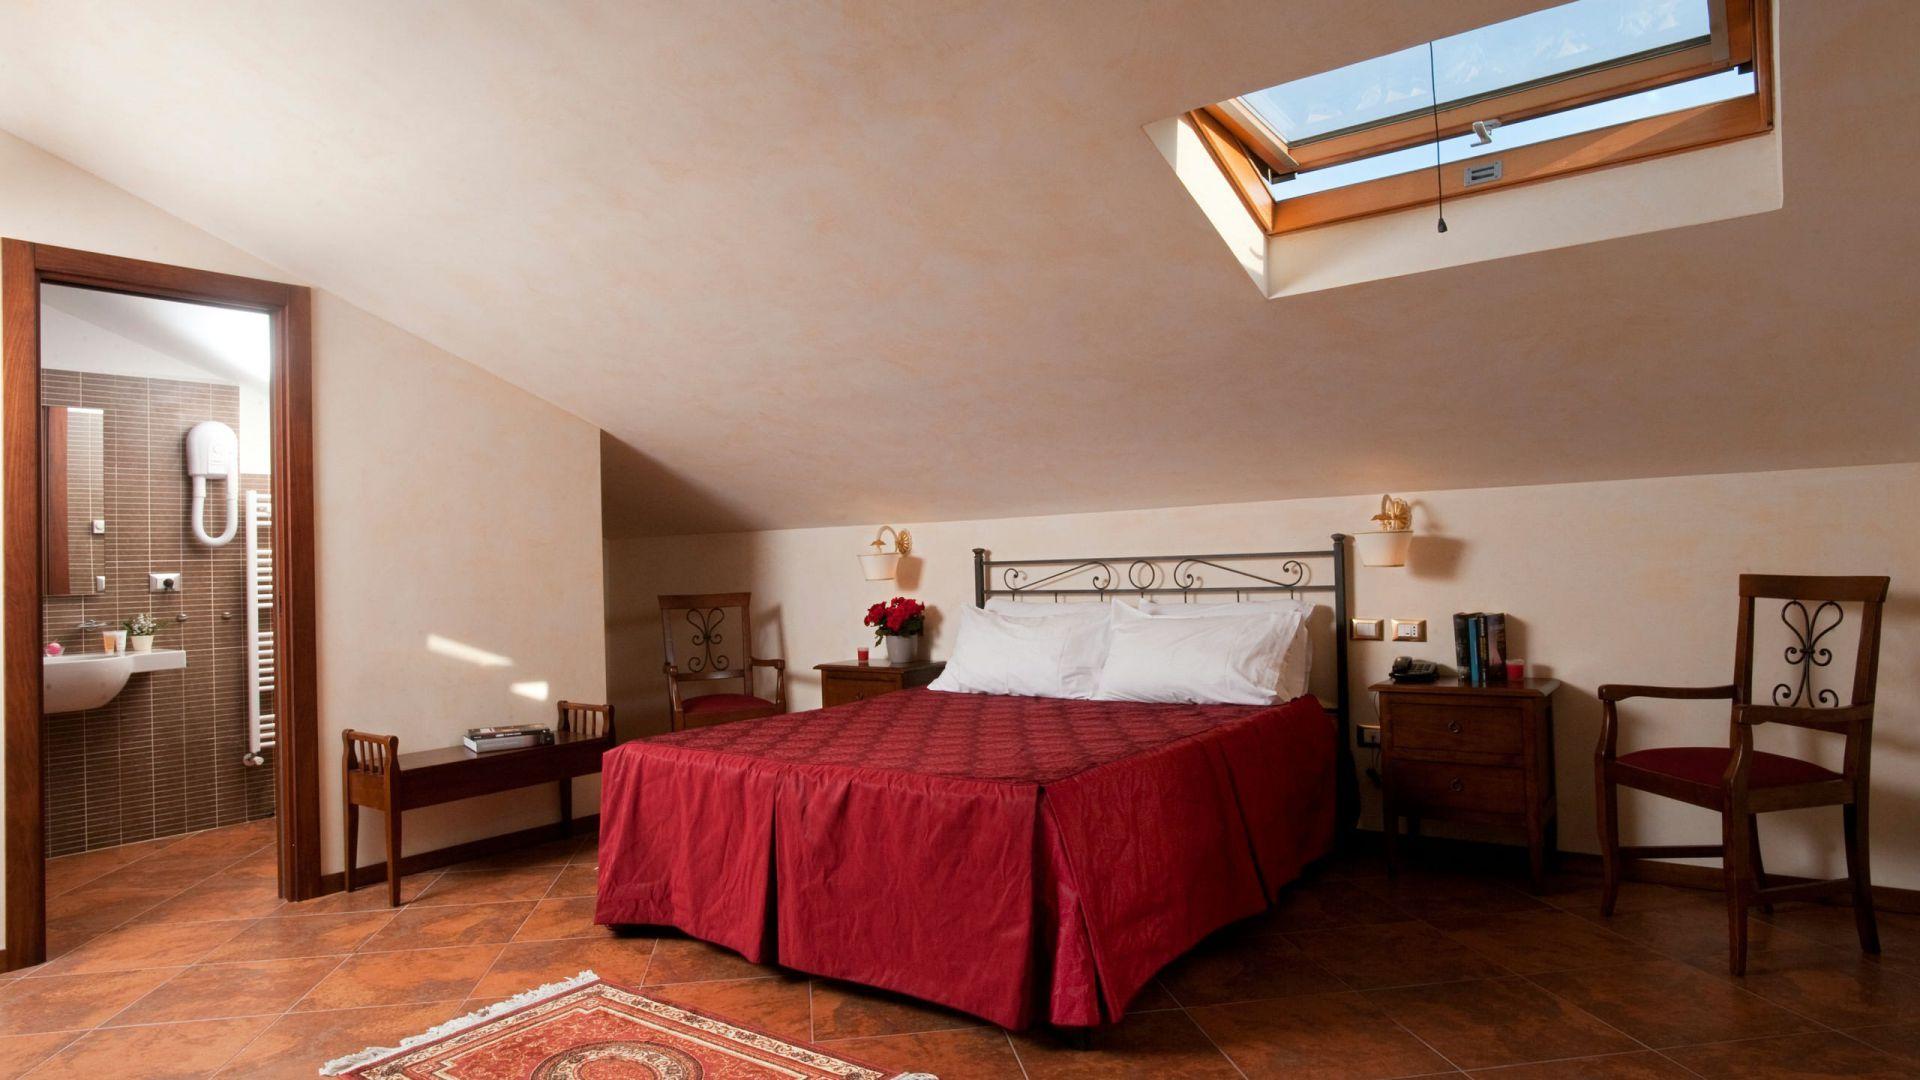 oc-casali-rome-rooms-17